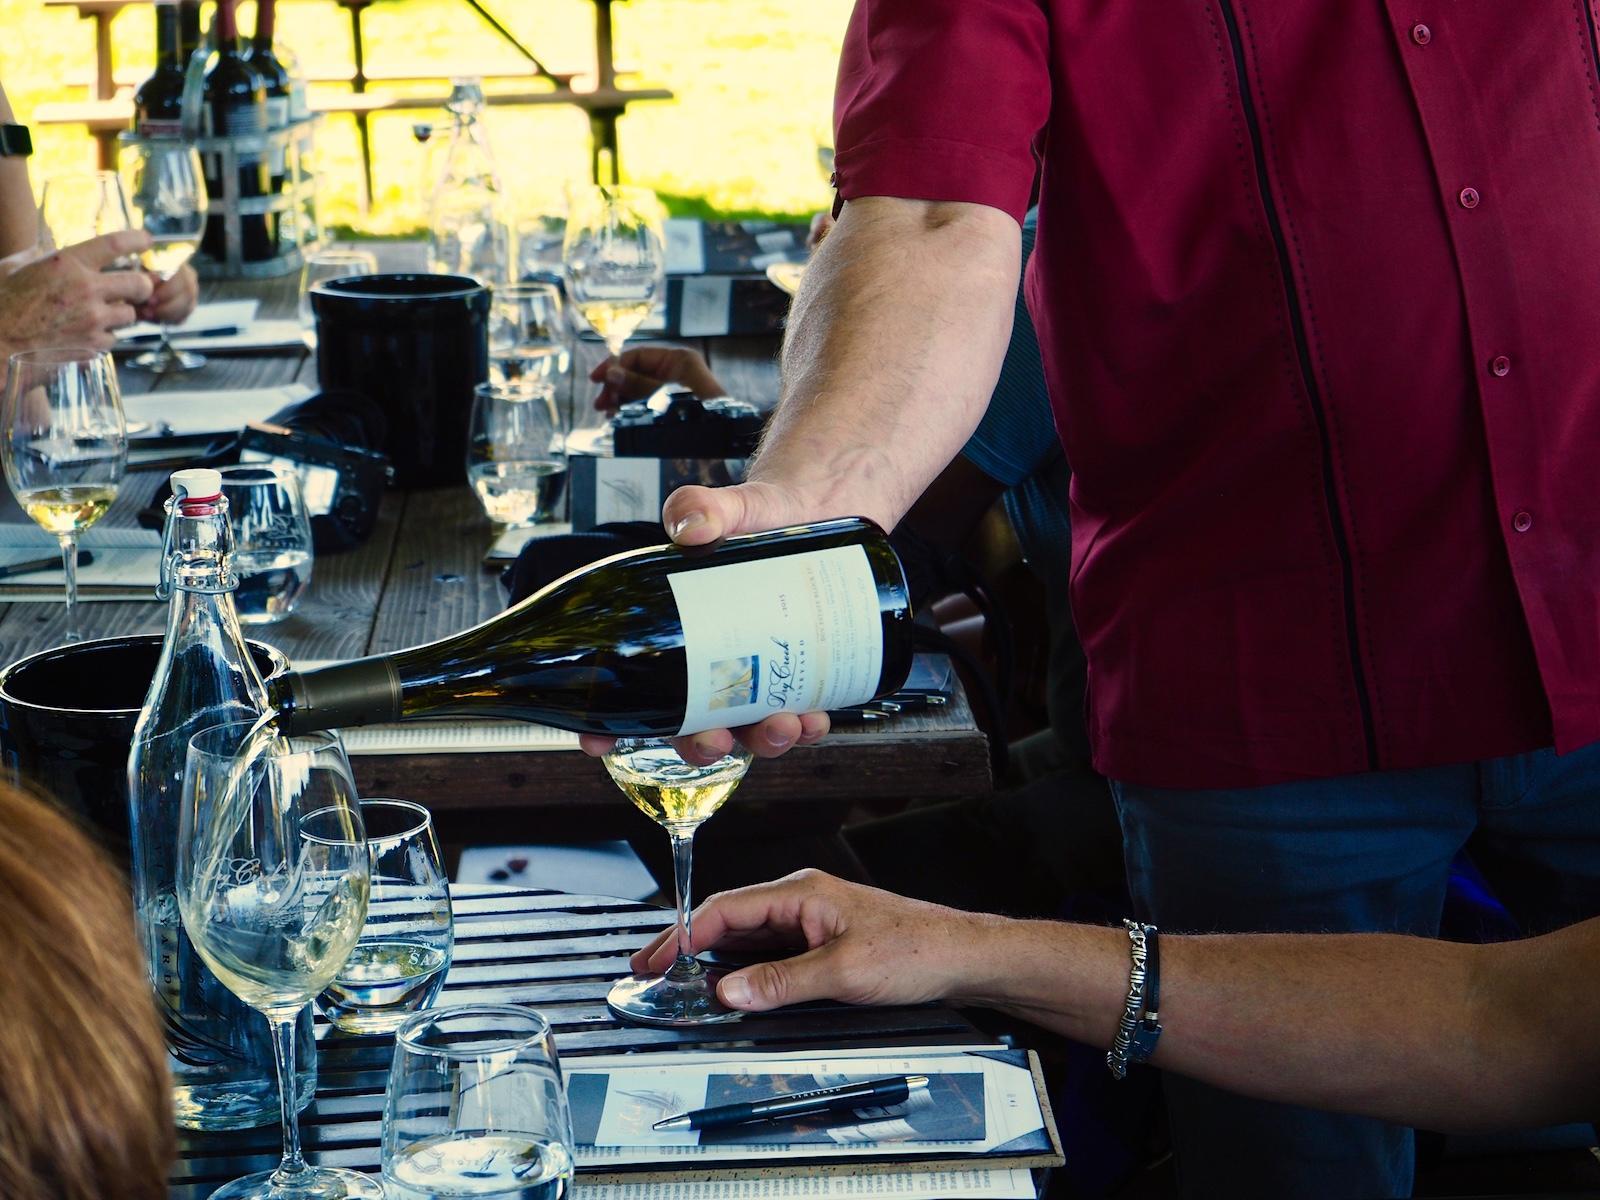 http://thedigitalstory.com/2017/10/29/wine-tasting.jpg